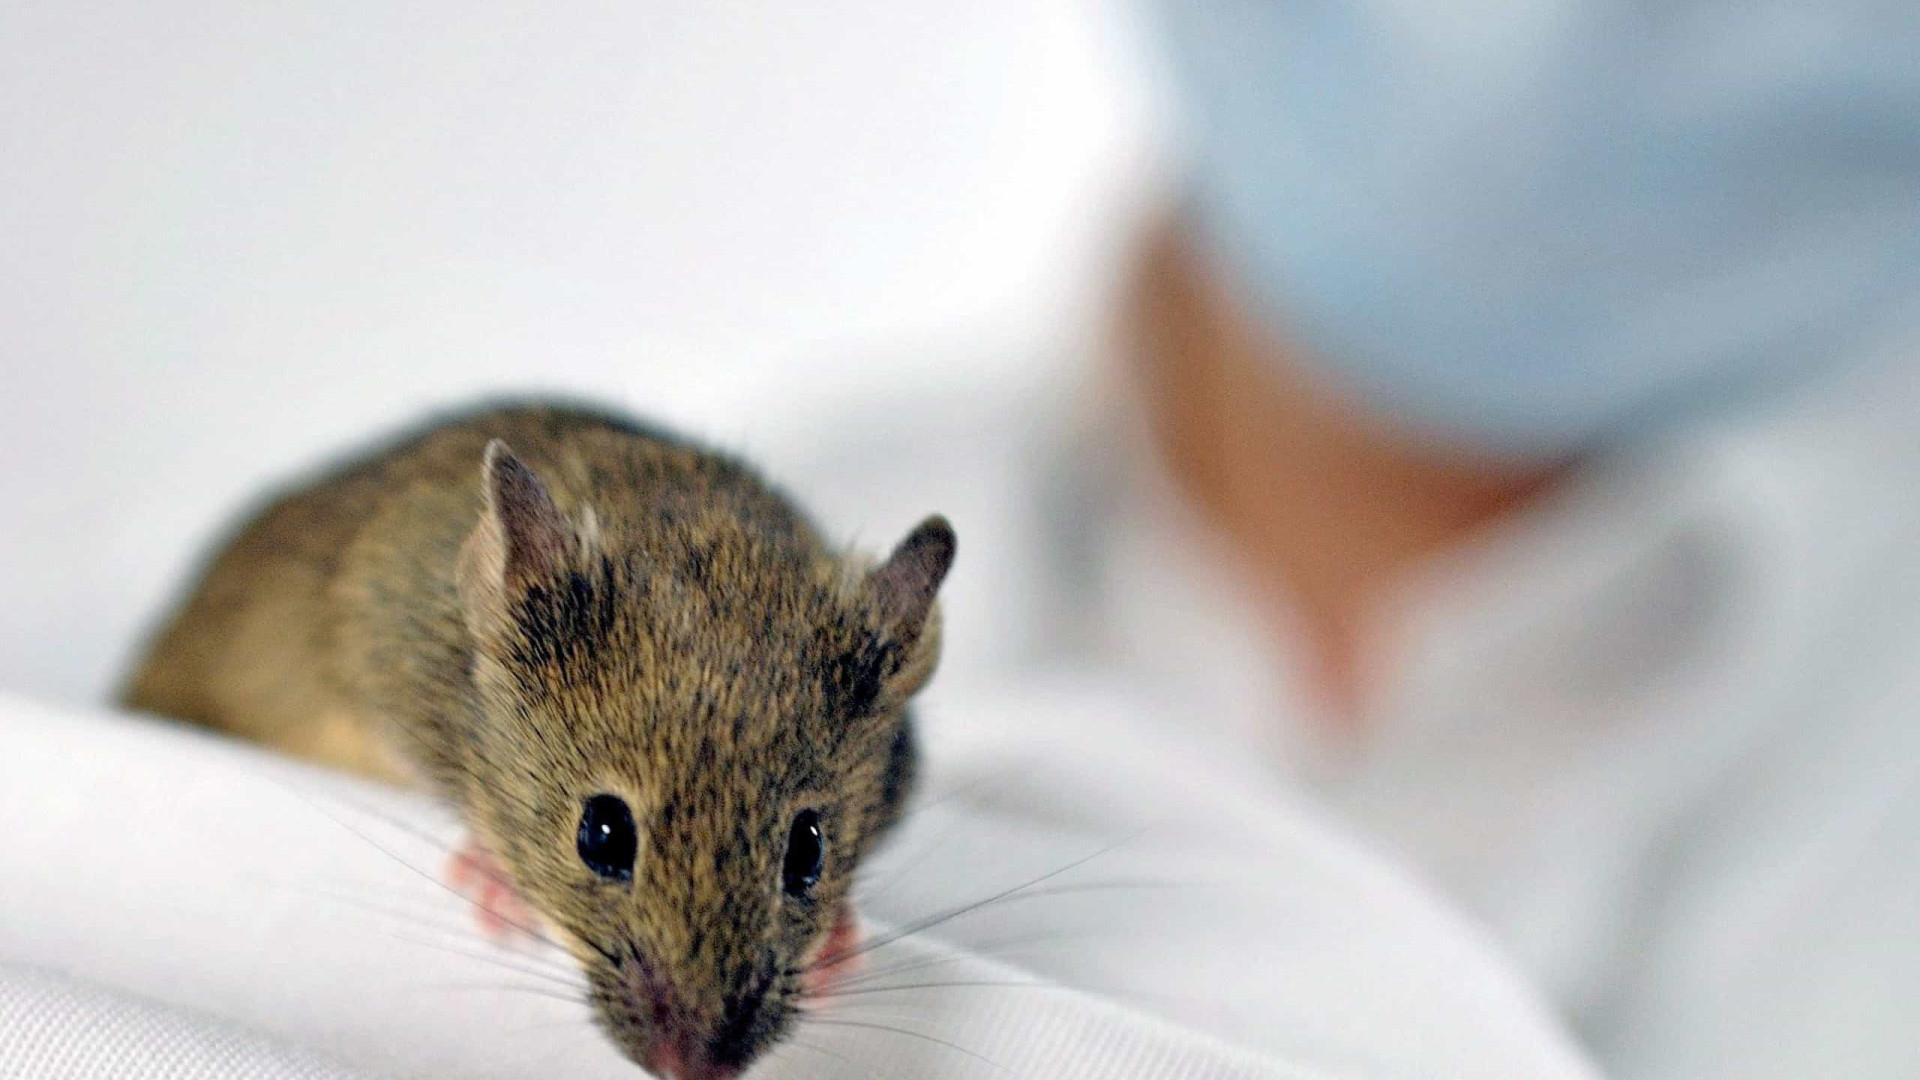 Cientistas criam rato transgénico para servir de alarme de pandemias